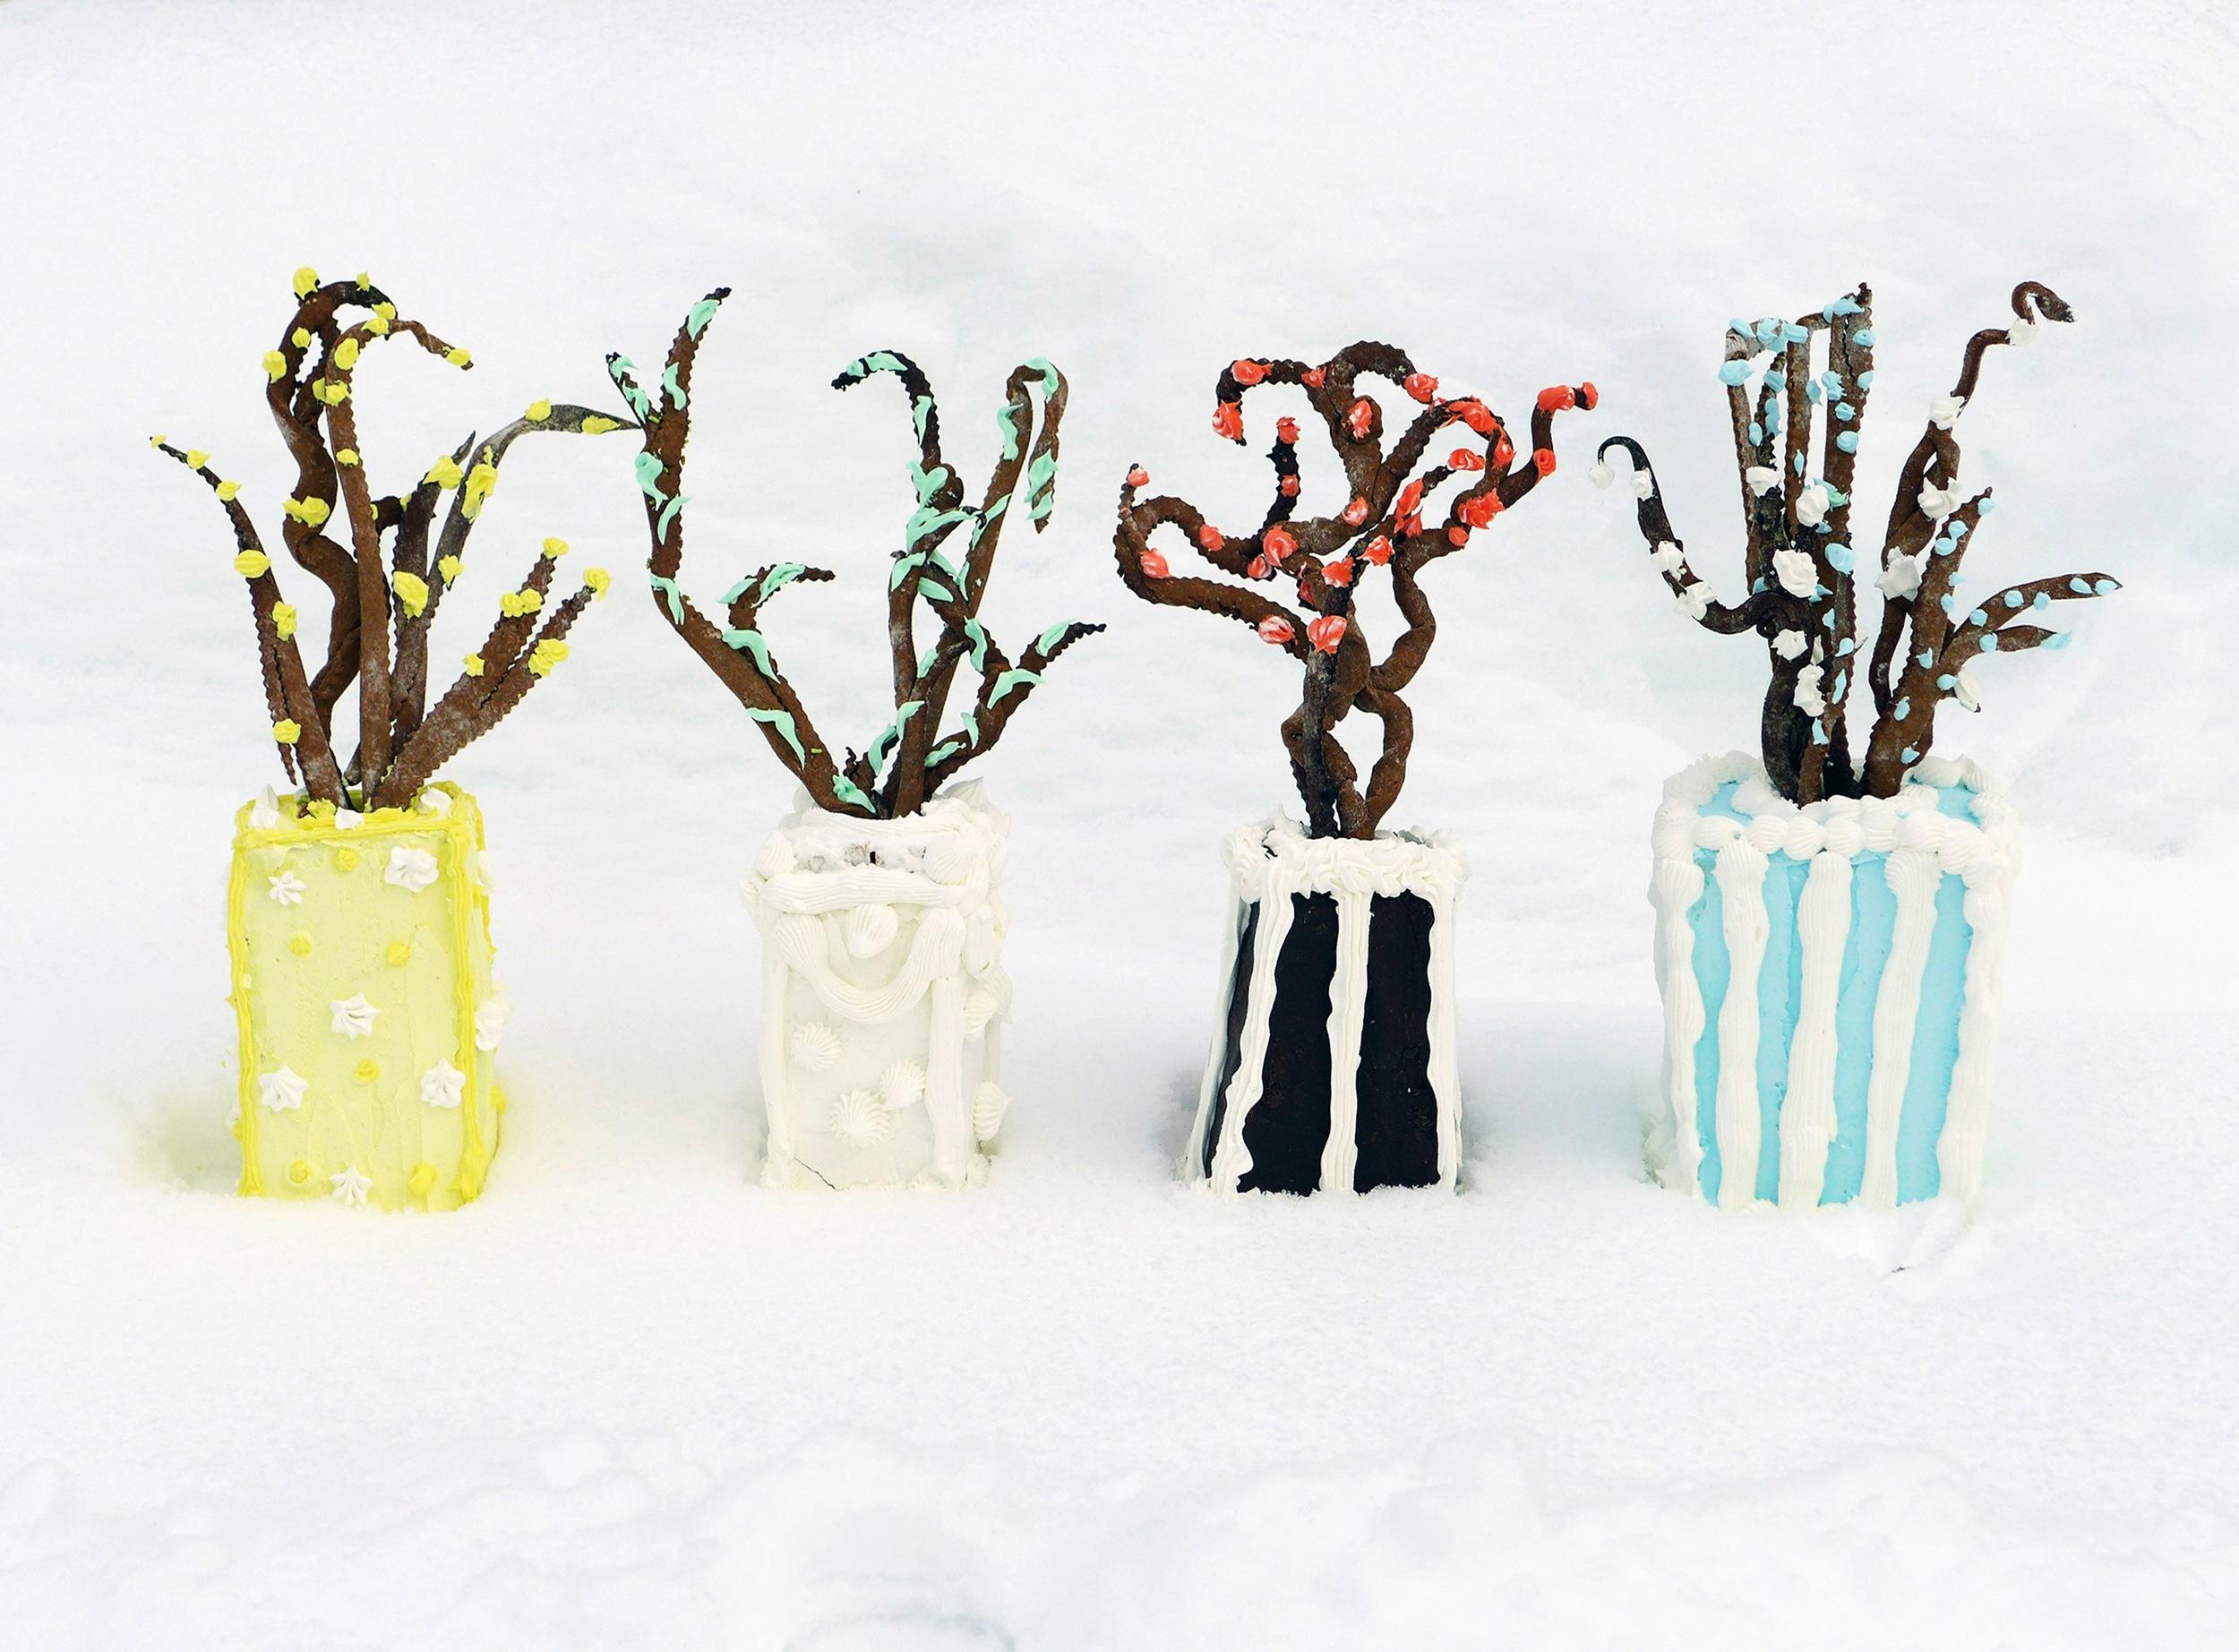 "Christa Maiwald, Winter Vase Cakes, archival pigment print, 21"" x 24"", edition 5"